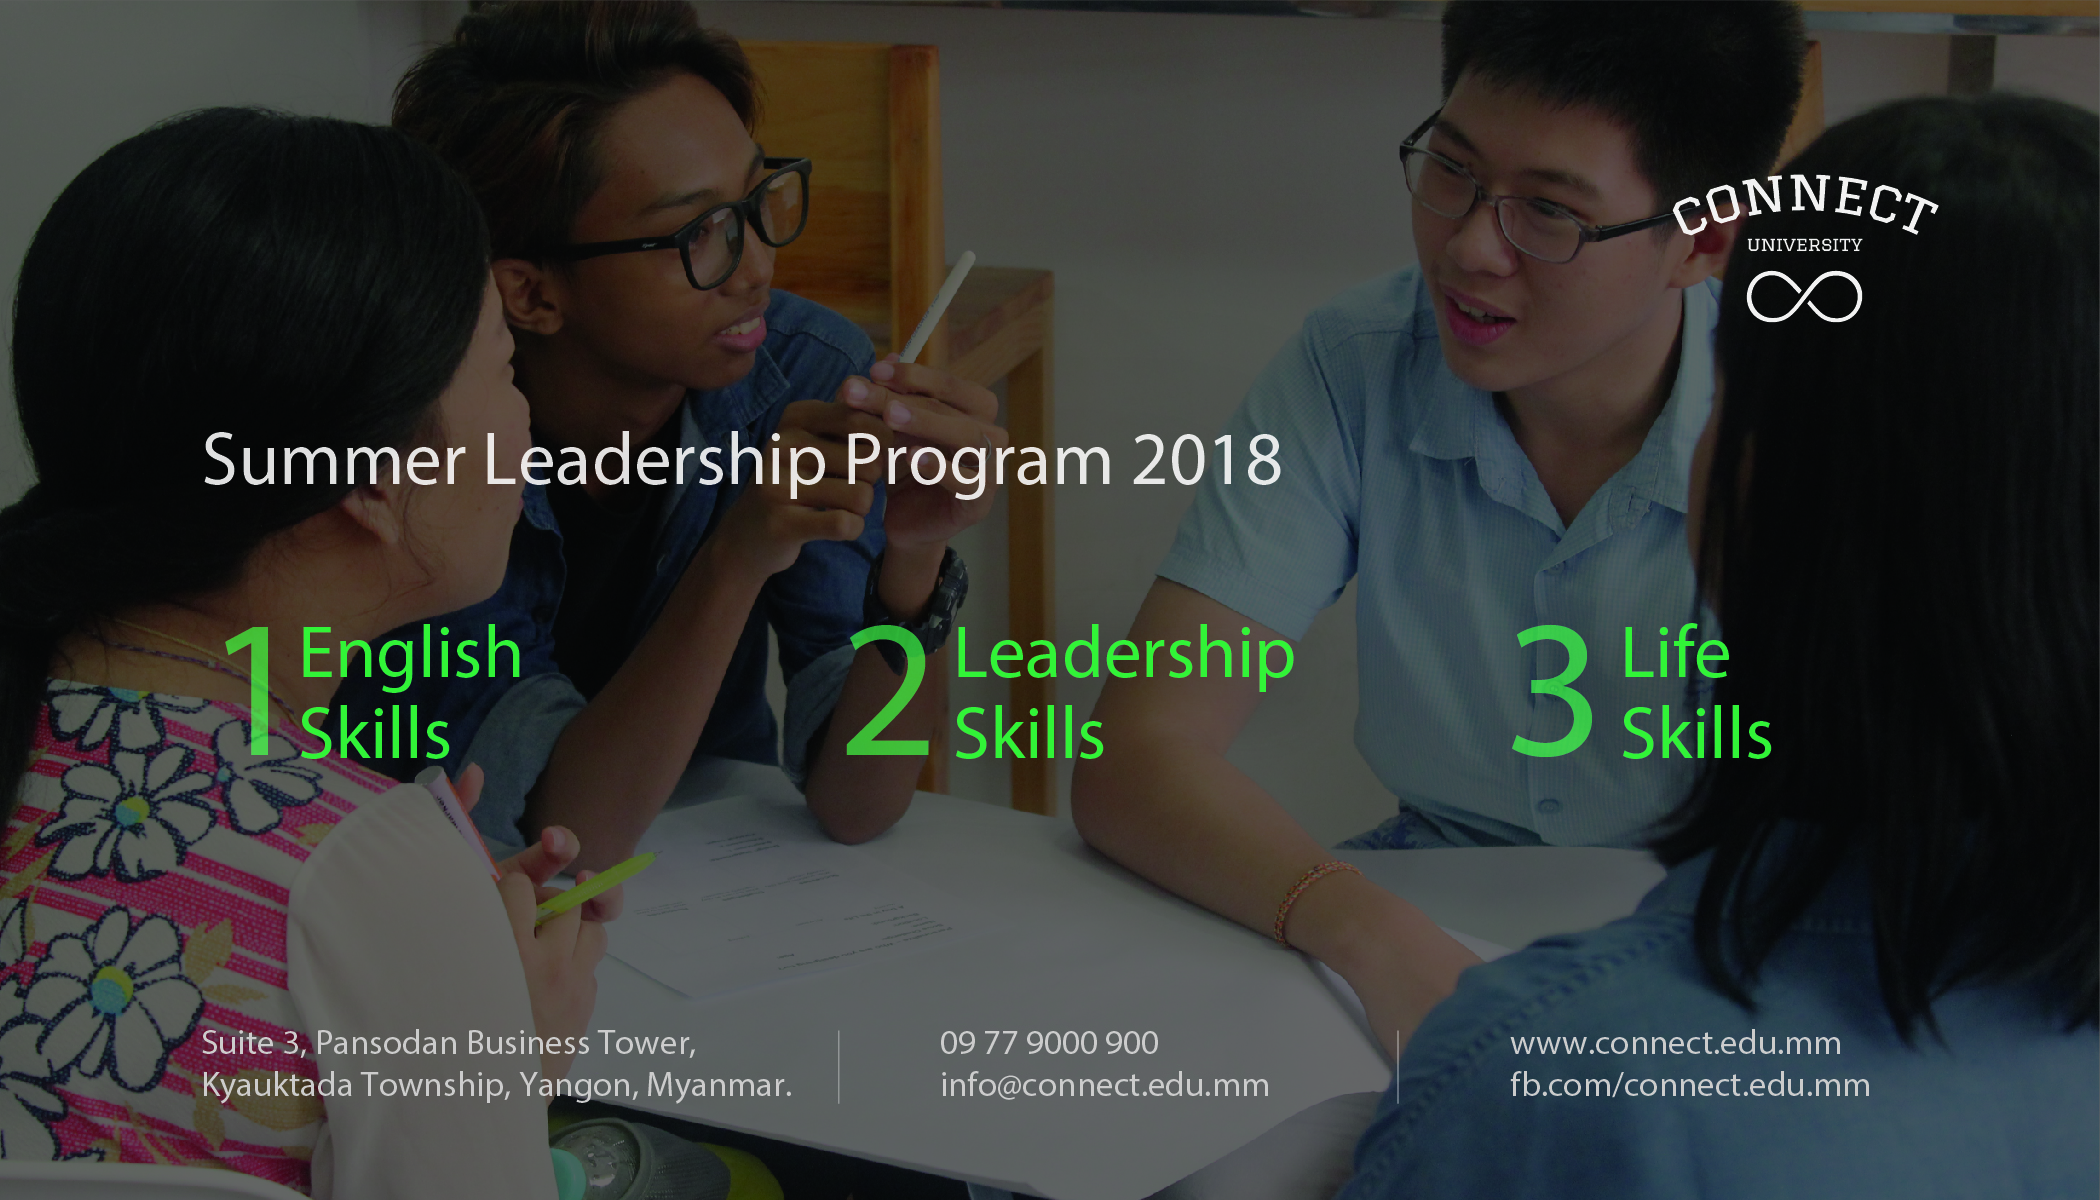 Summer Leadership Program of Connect University